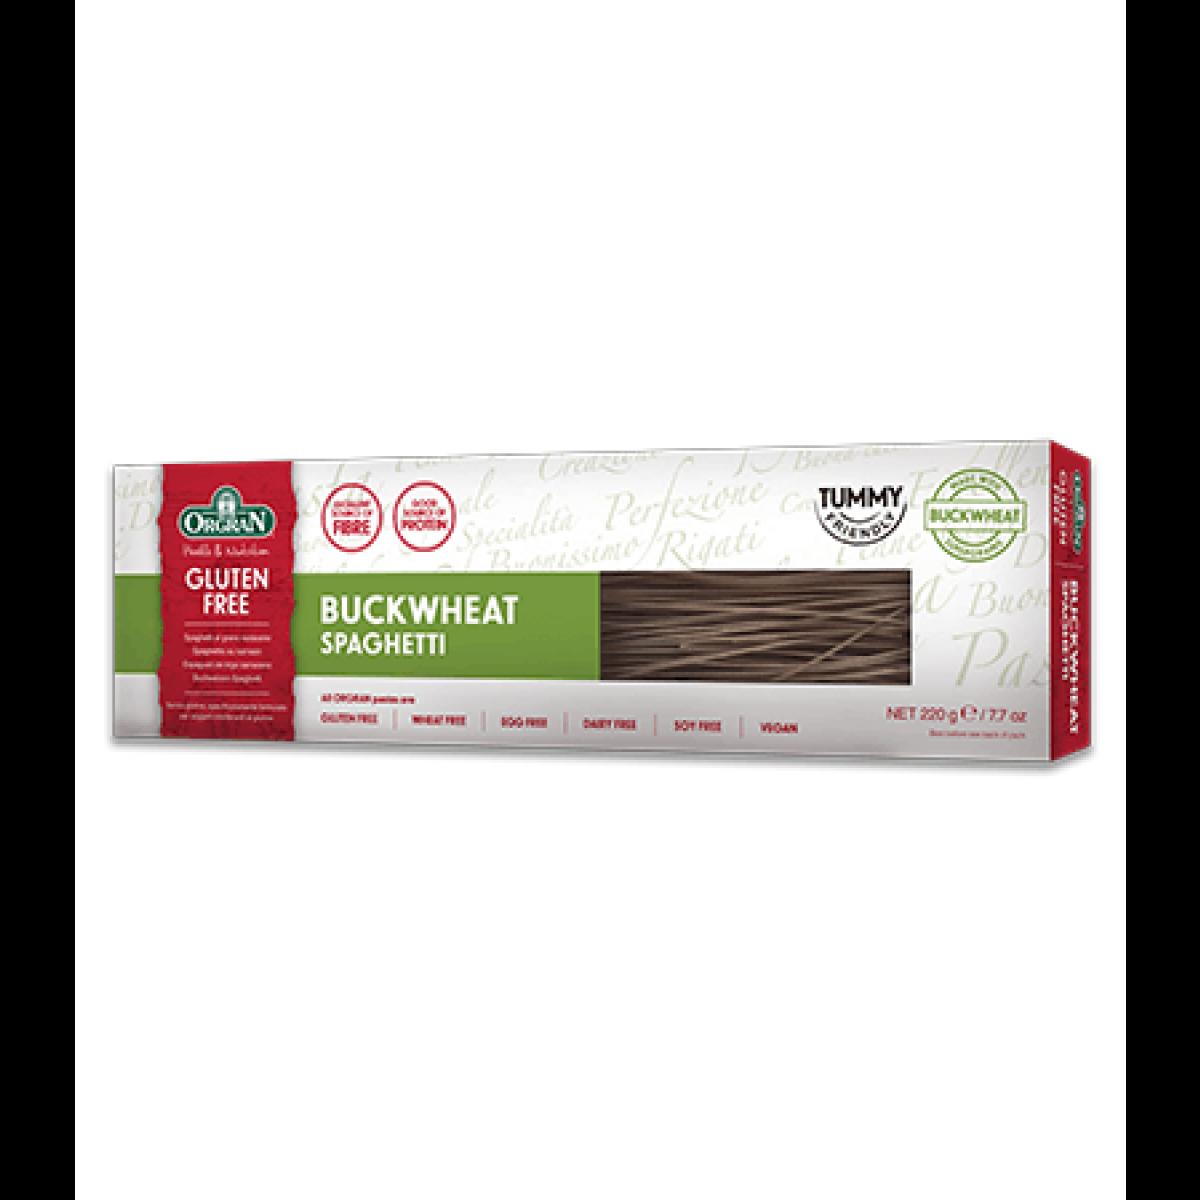 Boekweit Spaghetti (T.H.T. 7-8-2019)